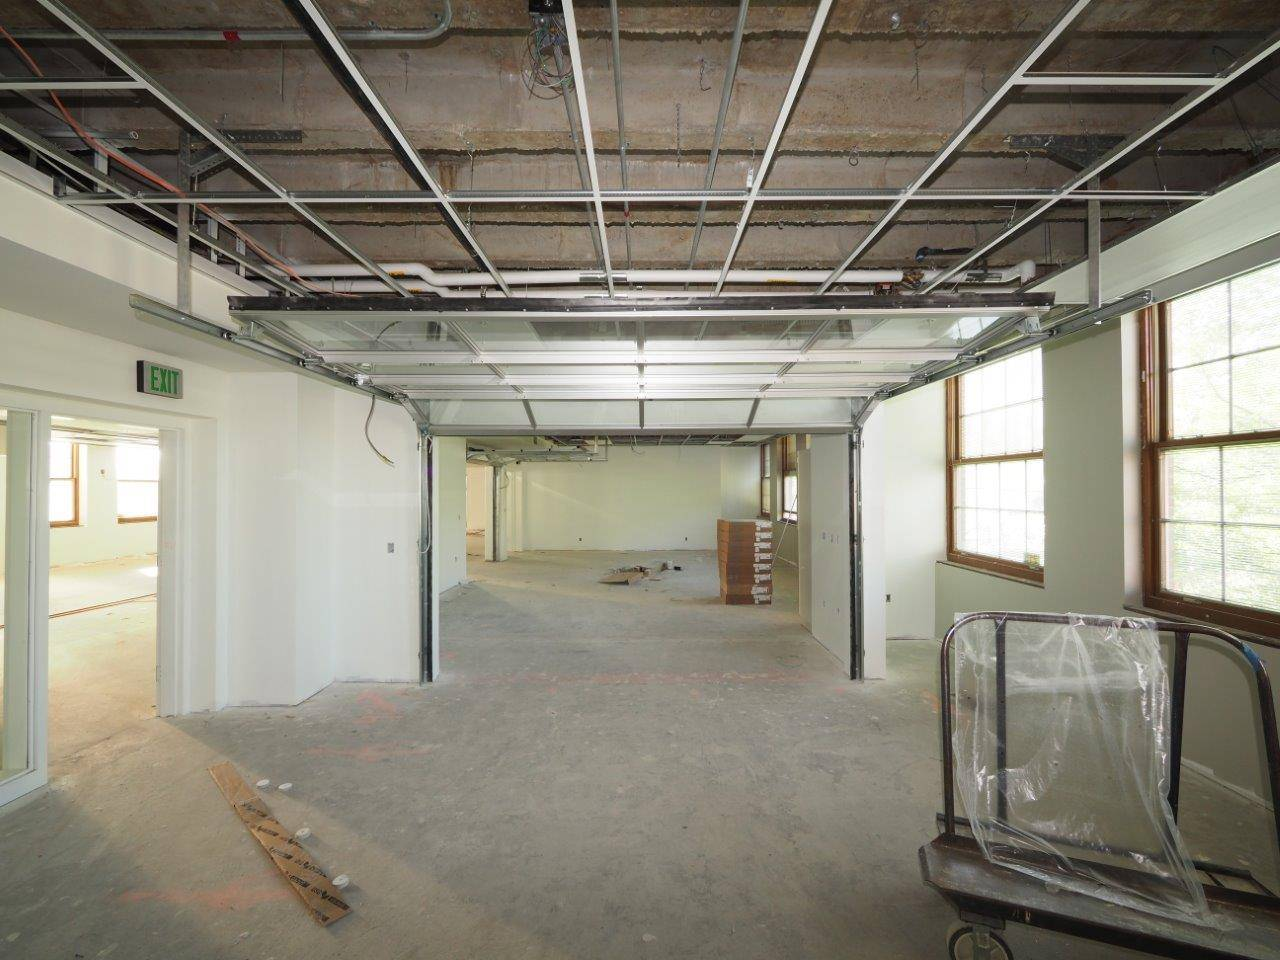 Barrington Elementary School renovation project